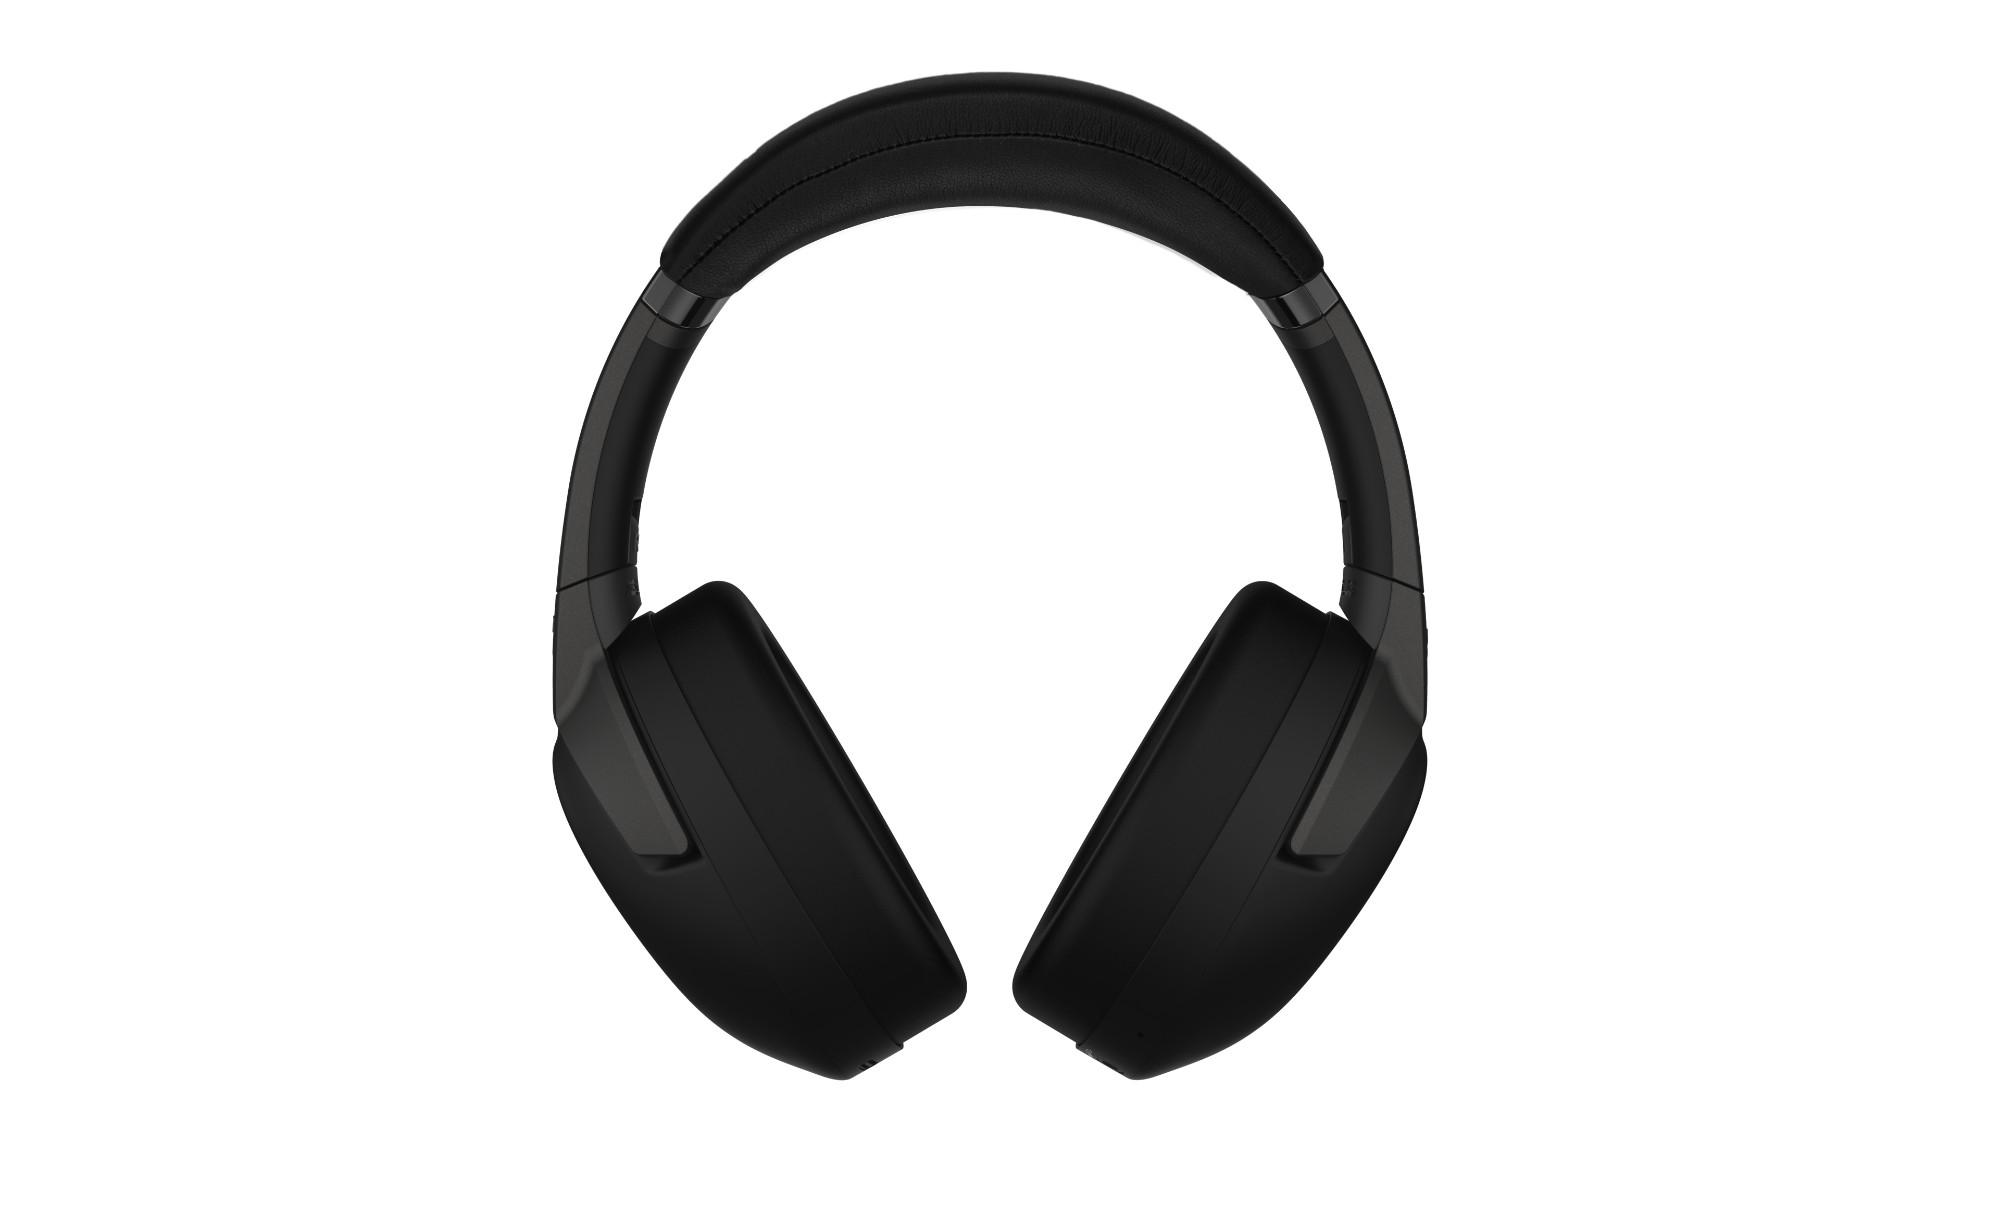 ASUS ROG Strix Go BT Headset Head-band 3.5 mm connector Bluetooth Black